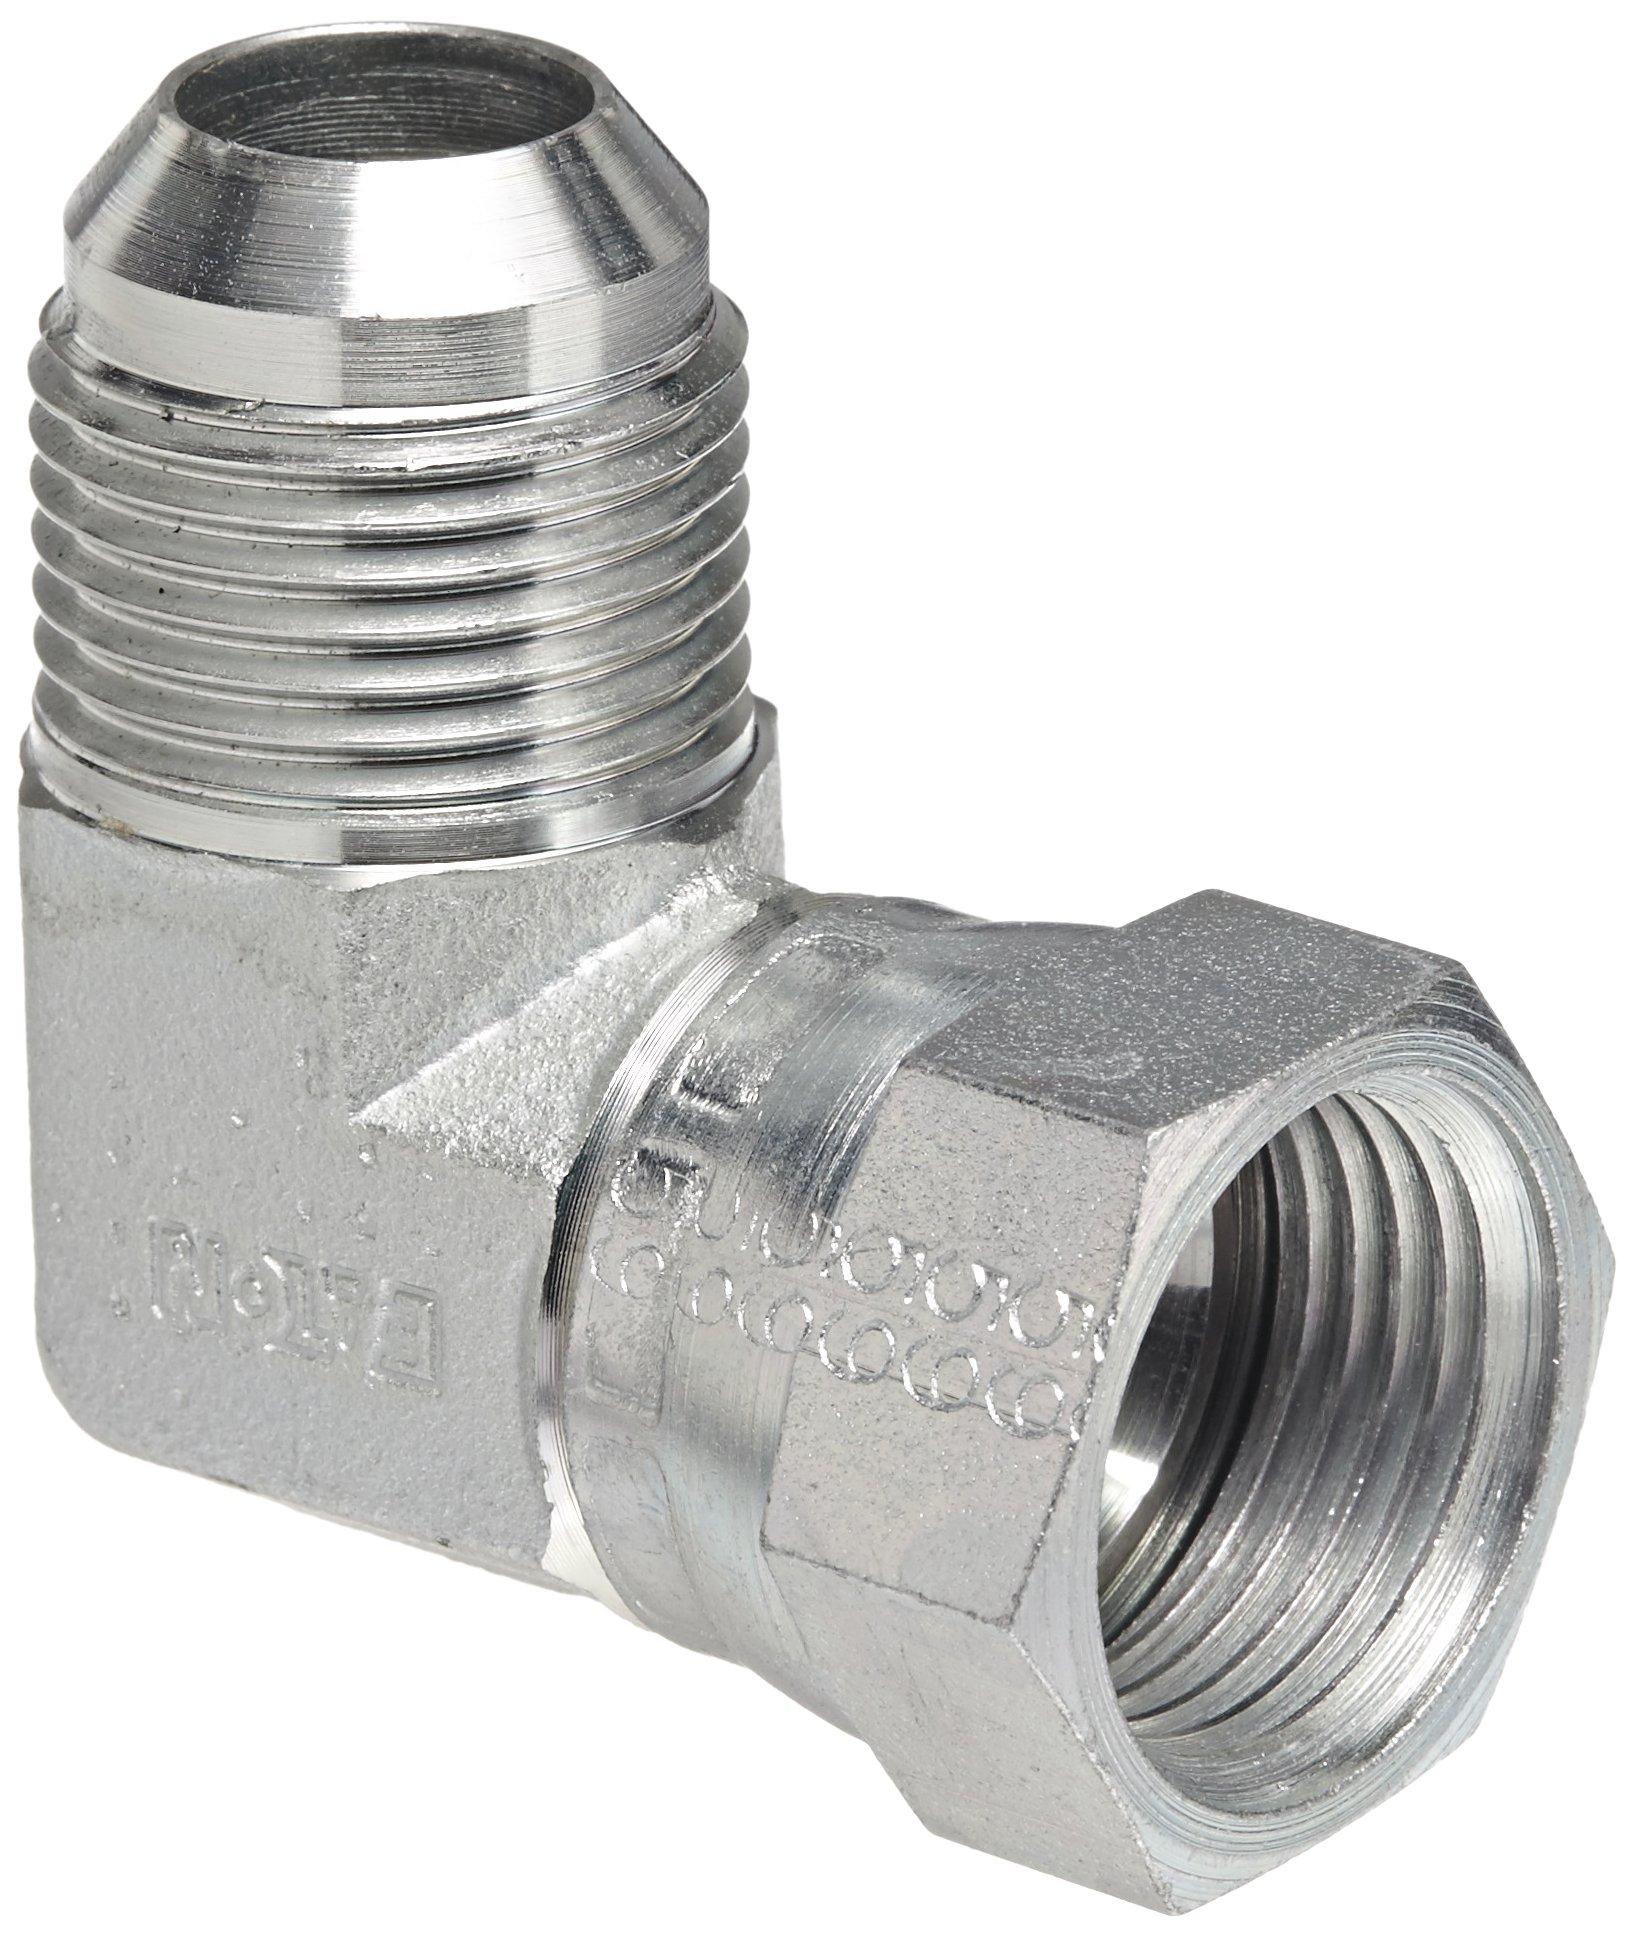 Eaton C5515X8 Lot Of 10 Each SAE 37° FlareTwin 90° Elbow Weatherhead